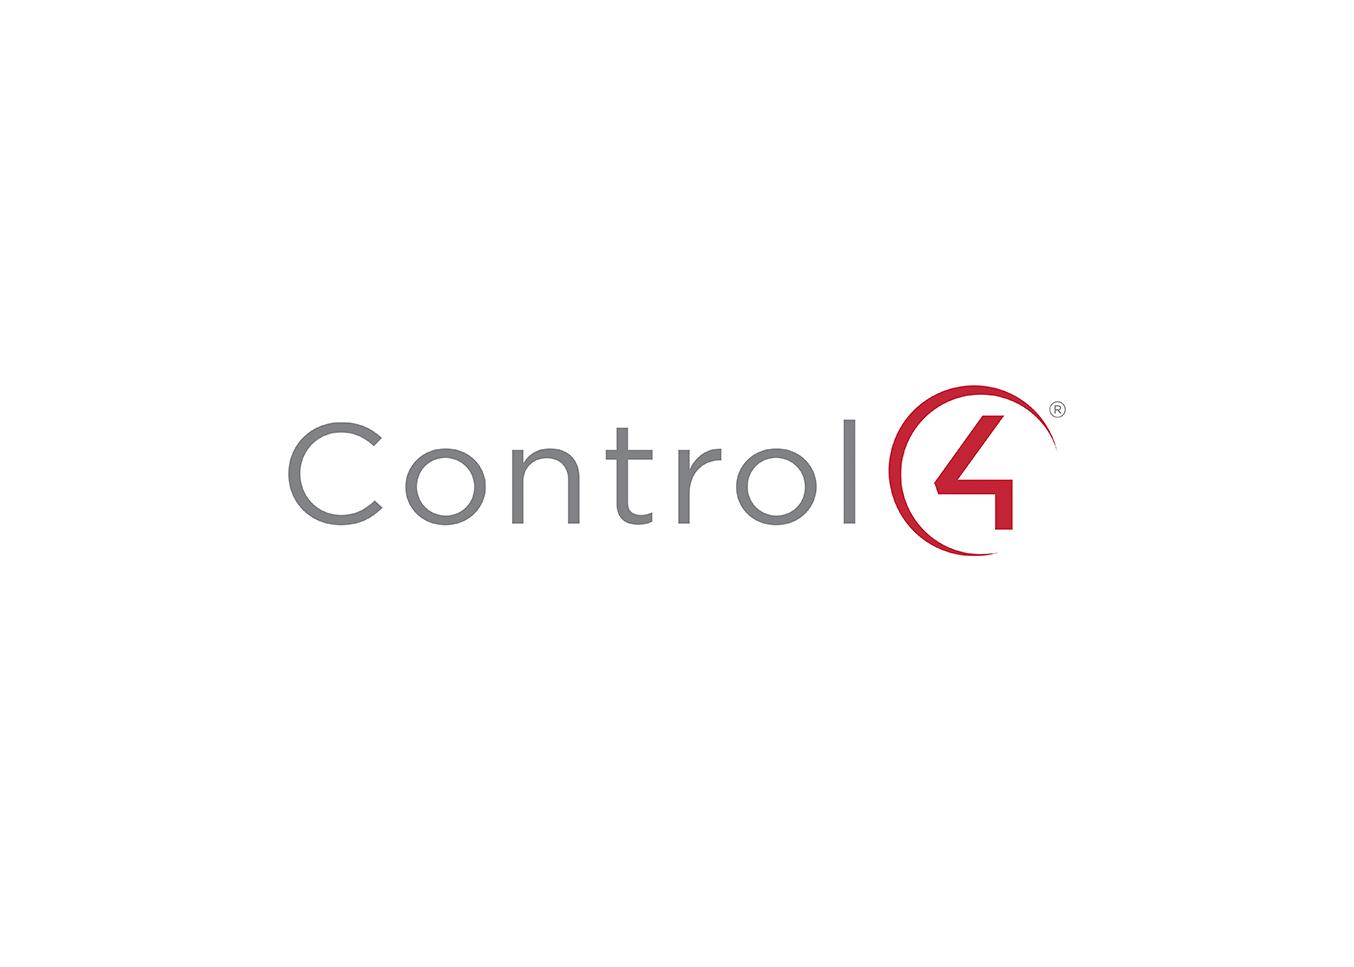 CERT_Control4.jpg